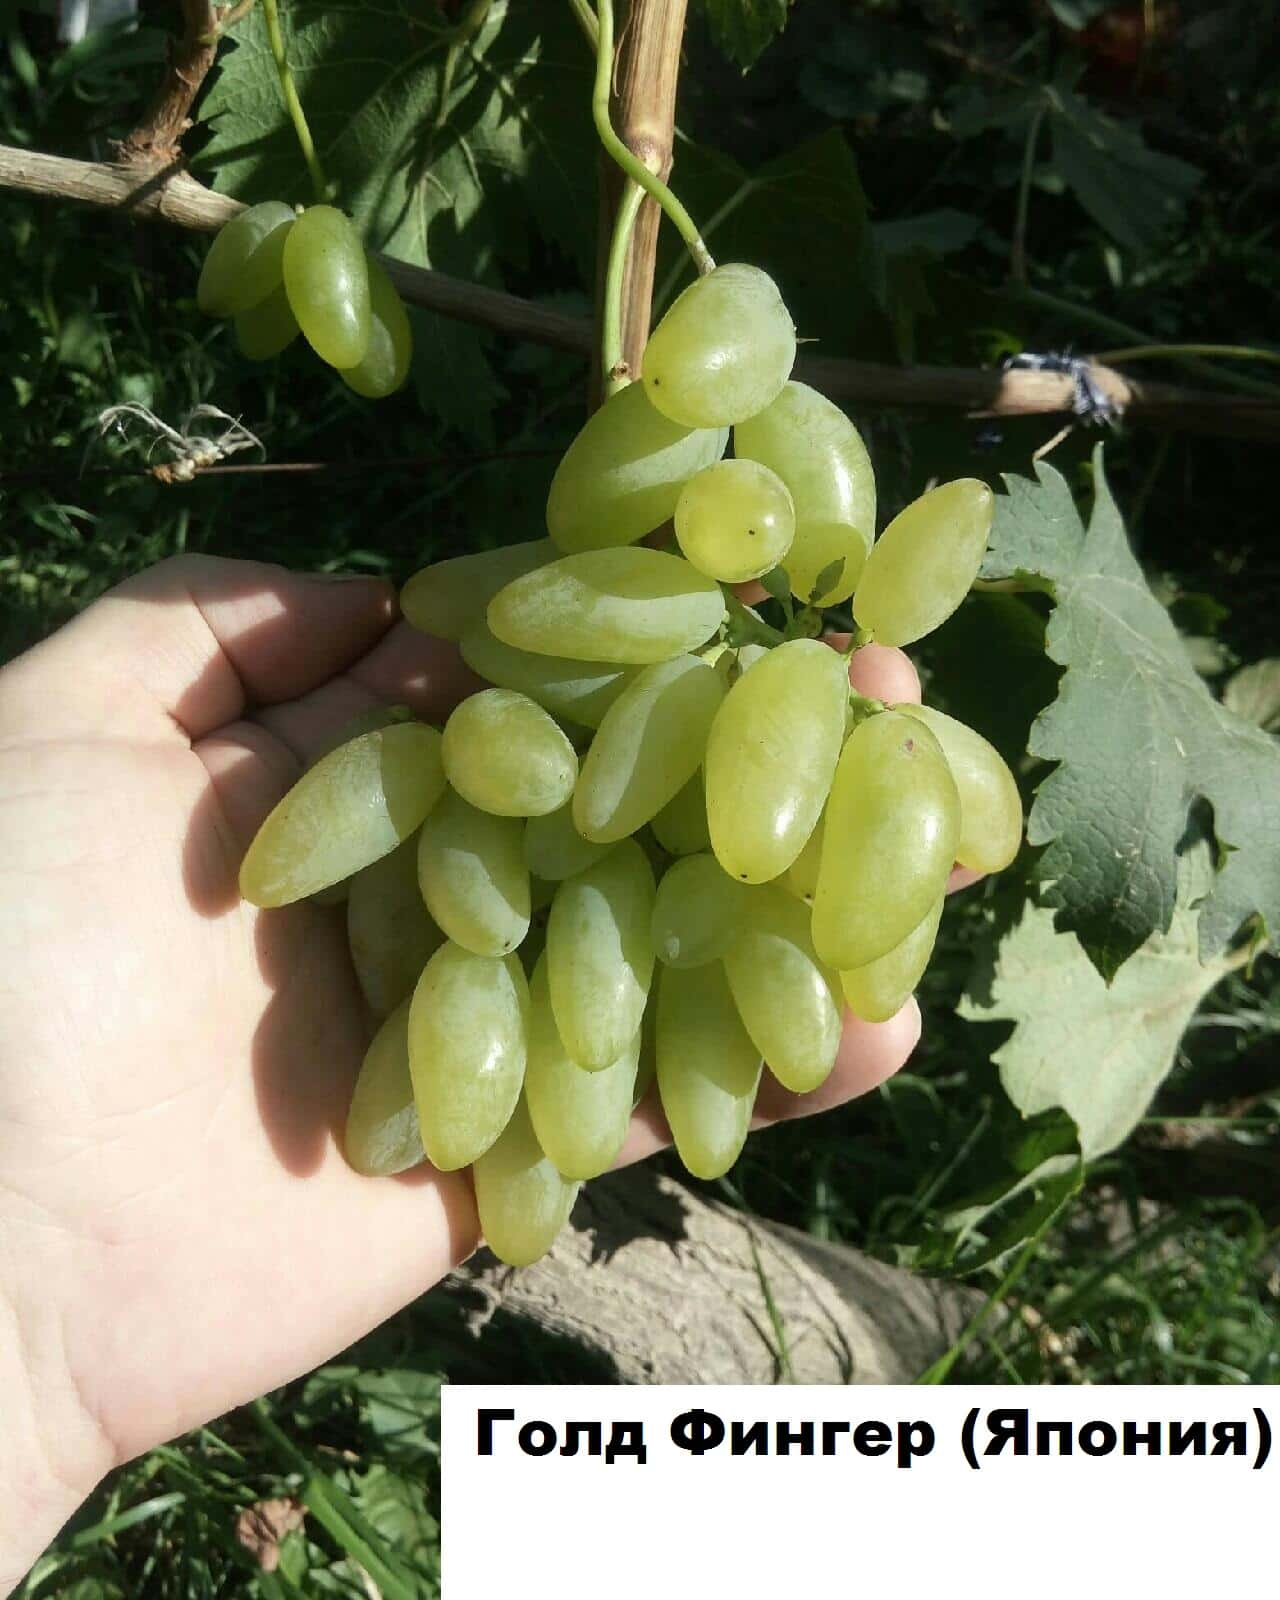 сорт винограда Голд фингер